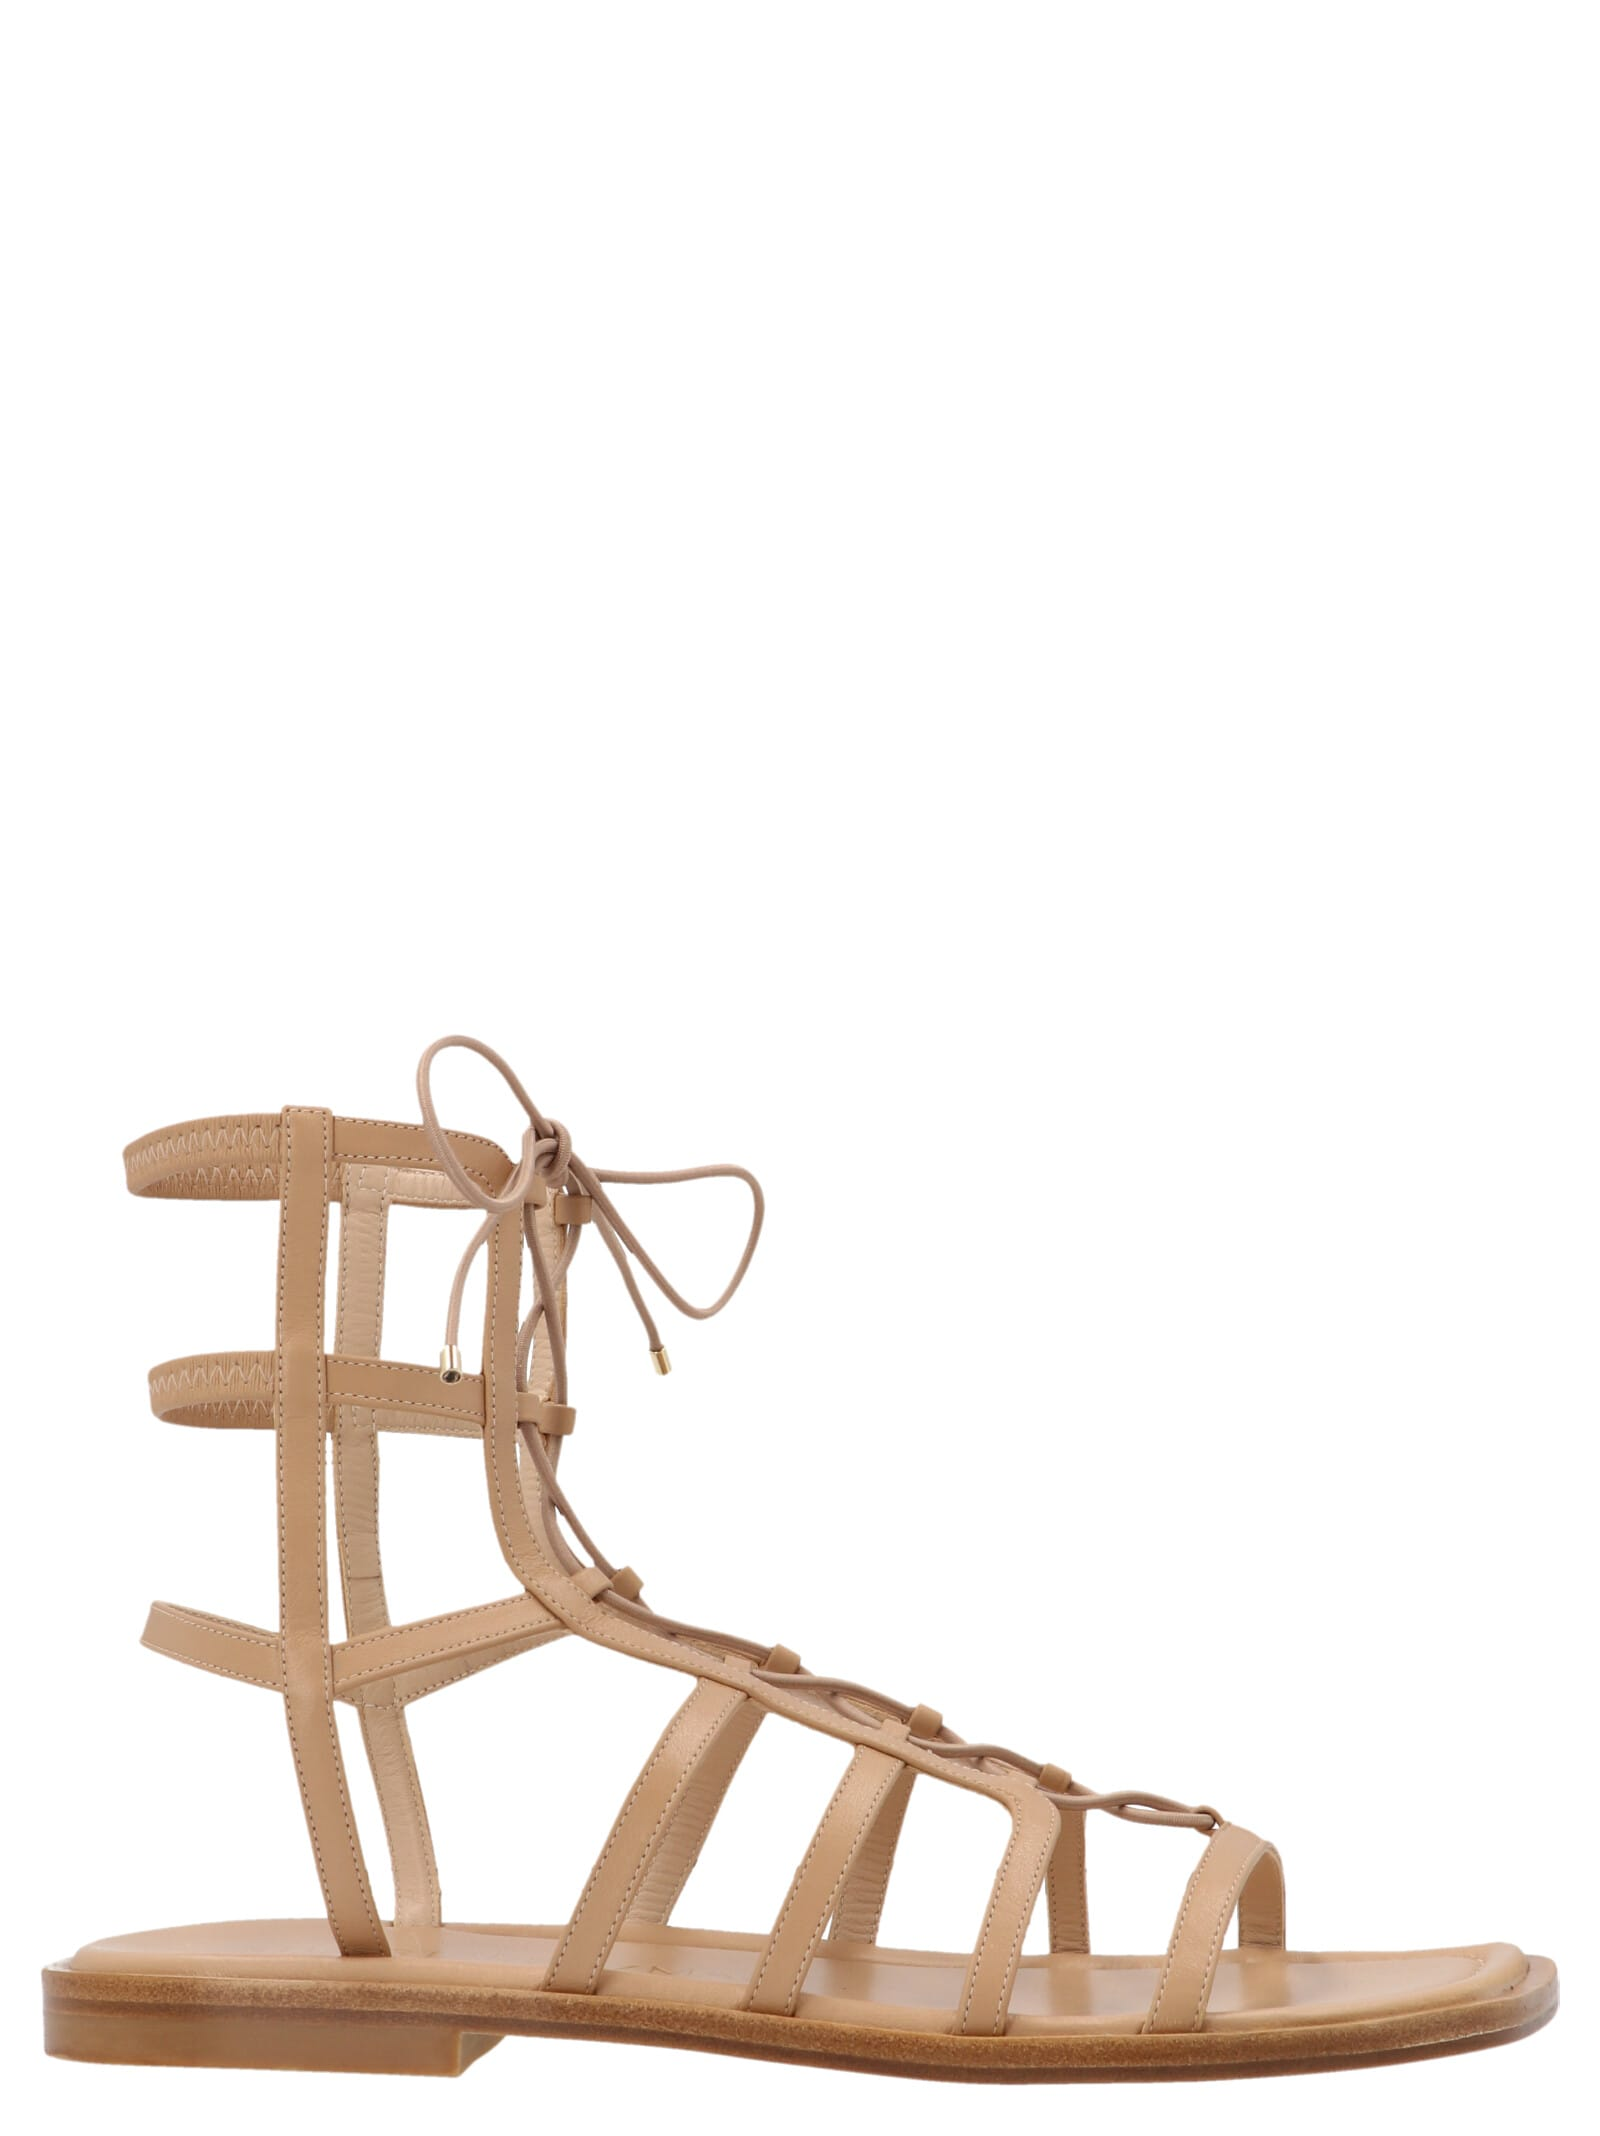 Buy Stuart Weitzman kora Shoes online, shop Stuart Weitzman shoes with free shipping